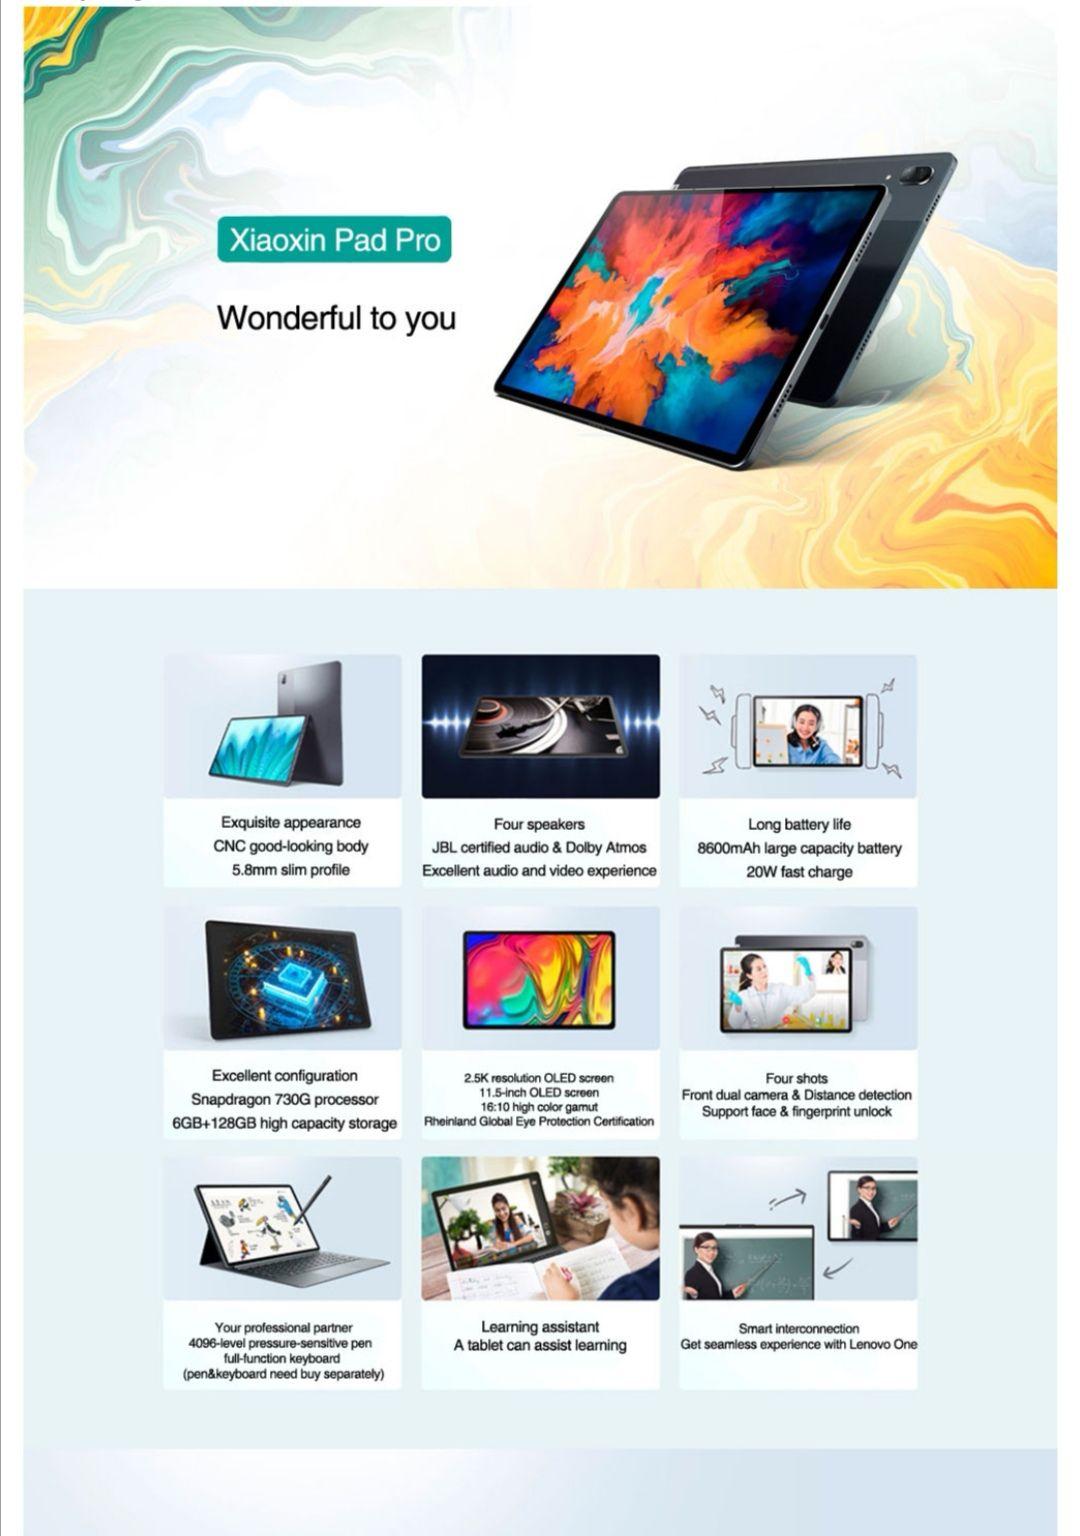 Lenovo XiaoXin Pad Pro Snapdragon 730G Octa Core 6GB RAM 128GB ROM 11.5 Inch OLED